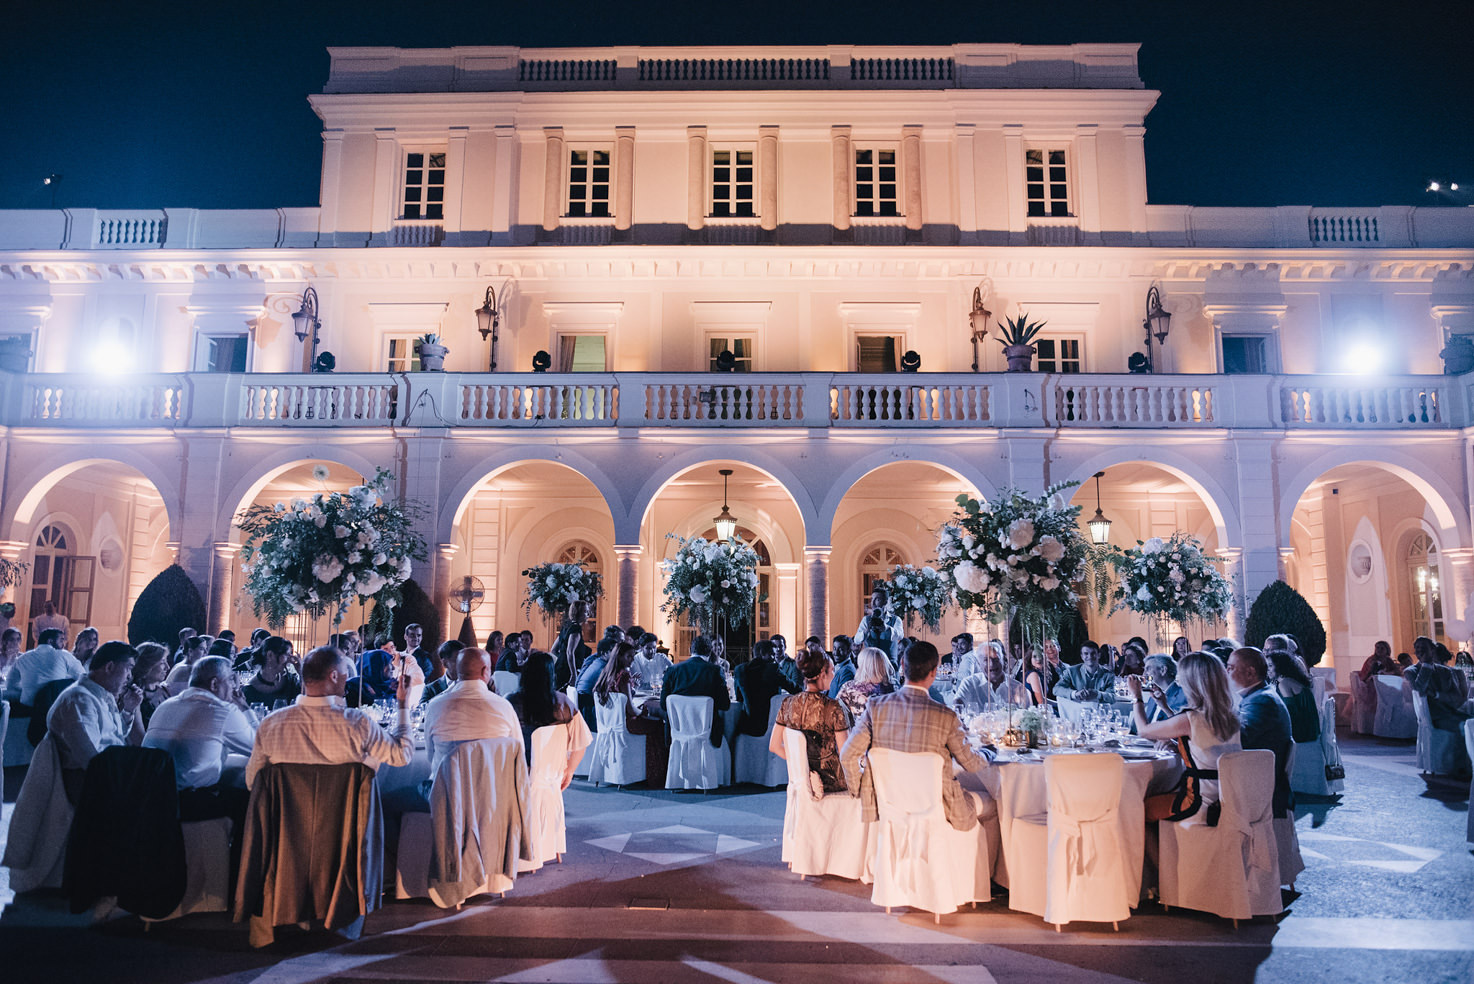 Wedding banquet on the patio of Villa Miani, Rome